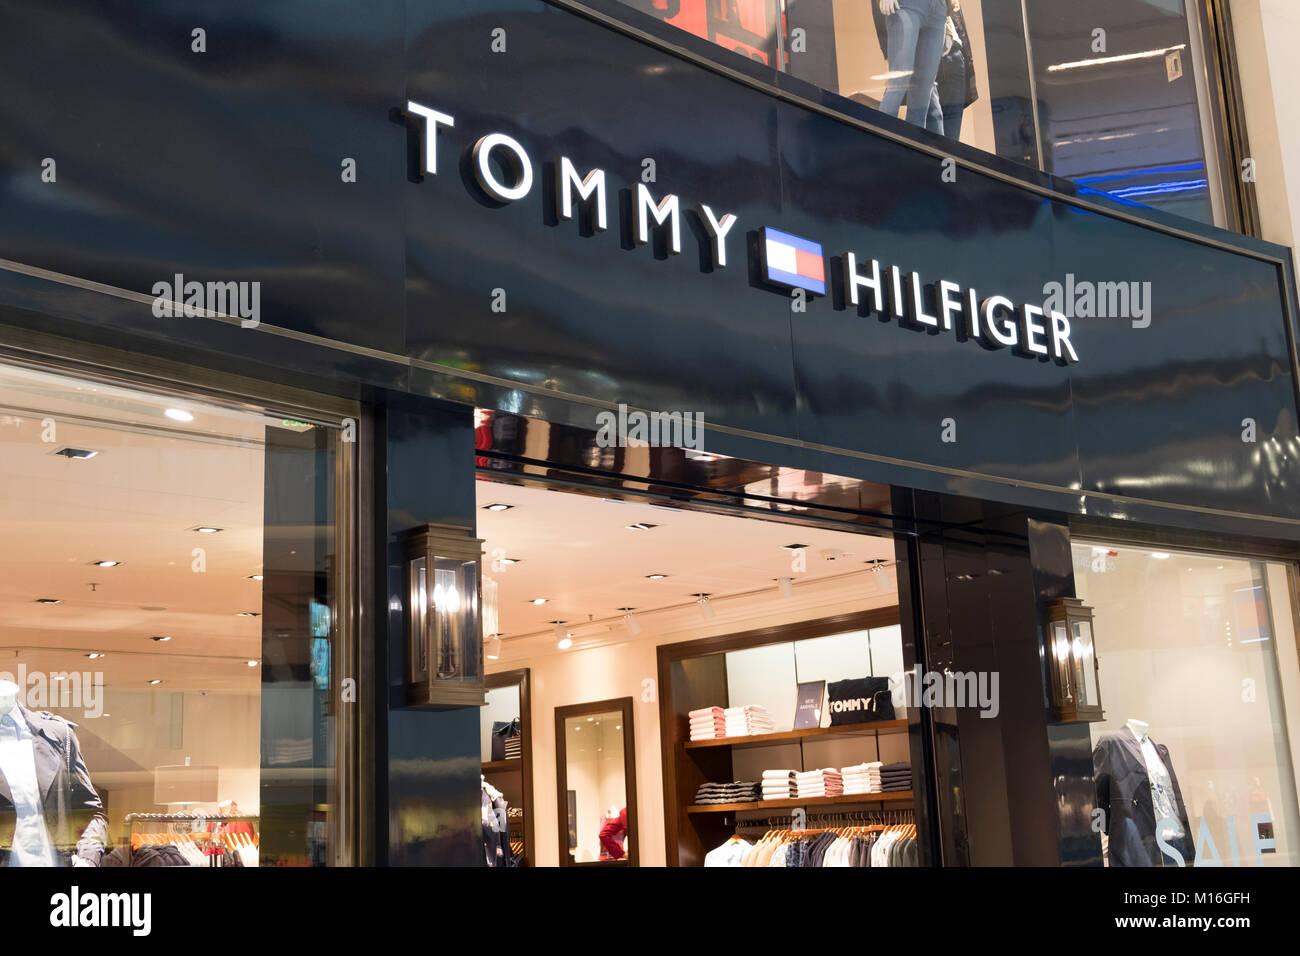 311b0bdea Tommy Hilfiger Clothing Stock Photos   Tommy Hilfiger Clothing Stock ...